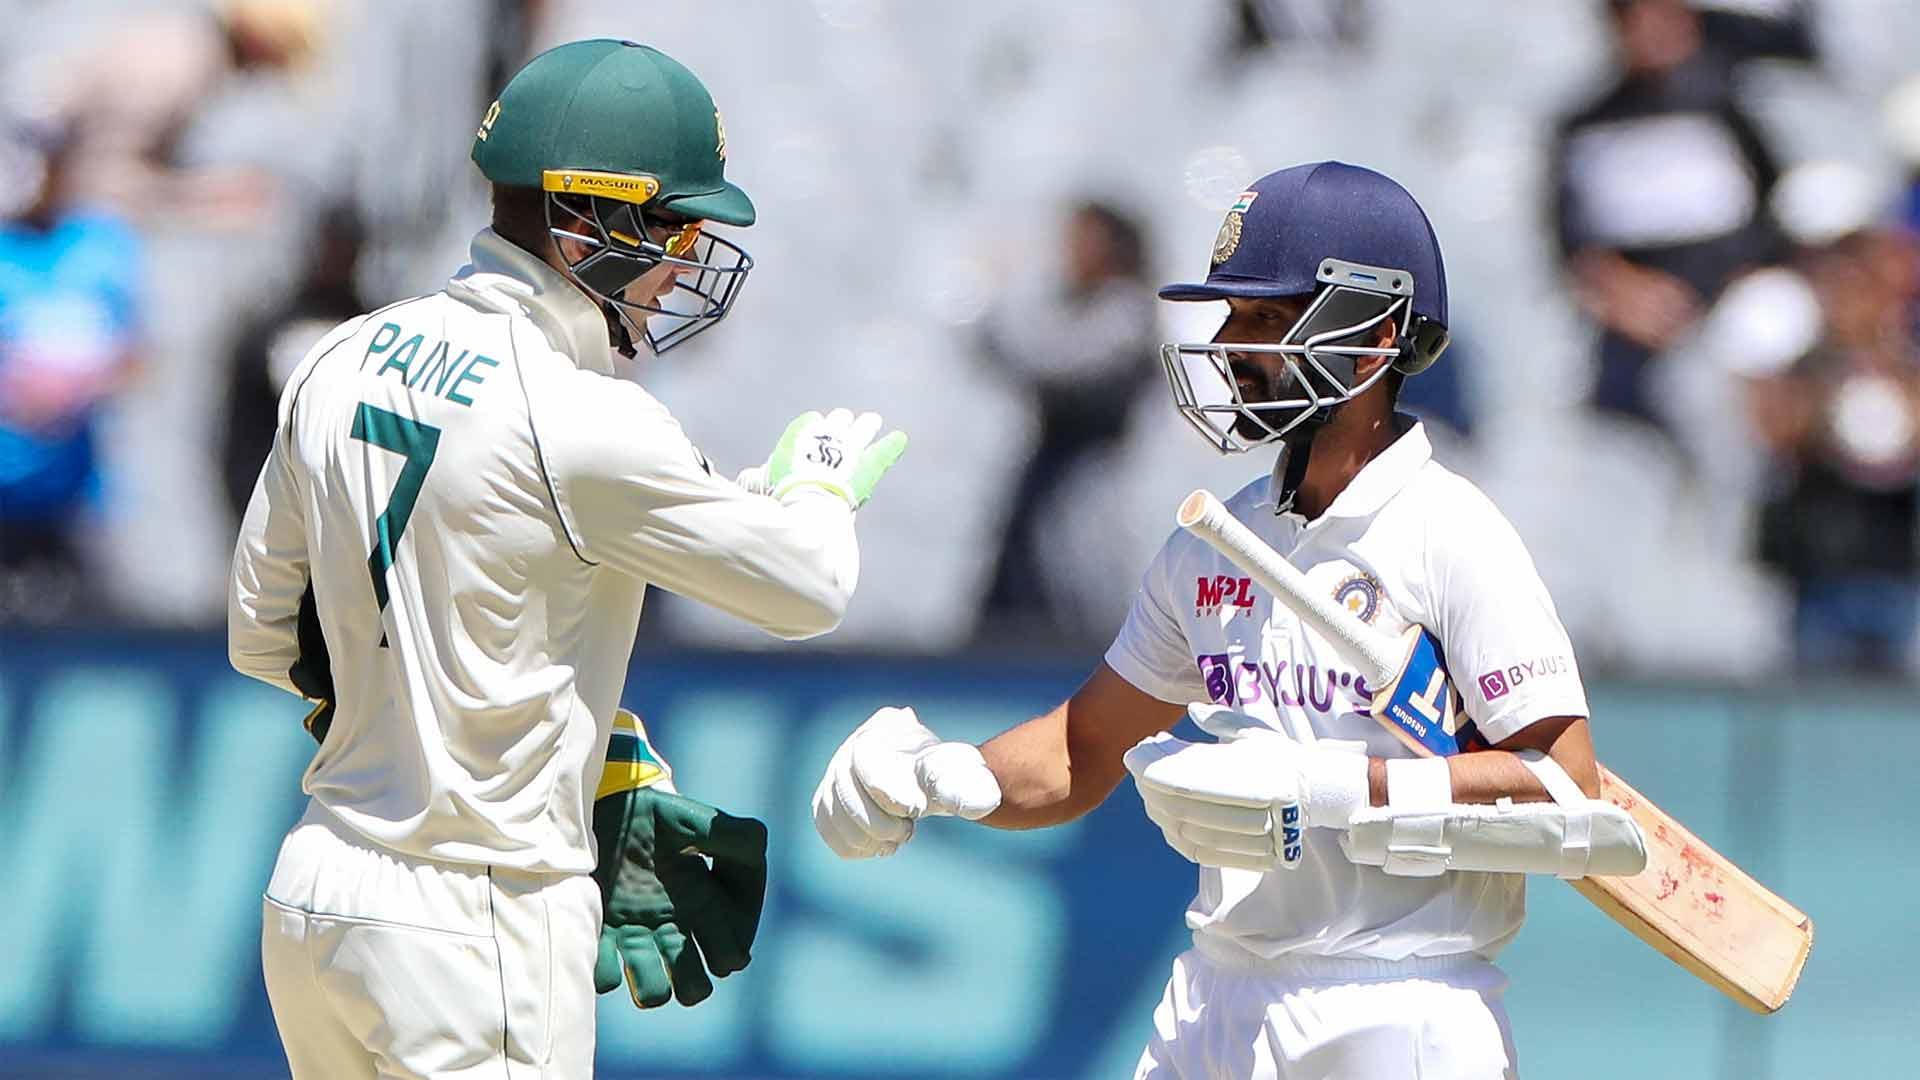 मेलबर्न टेस्ट भारत जीत